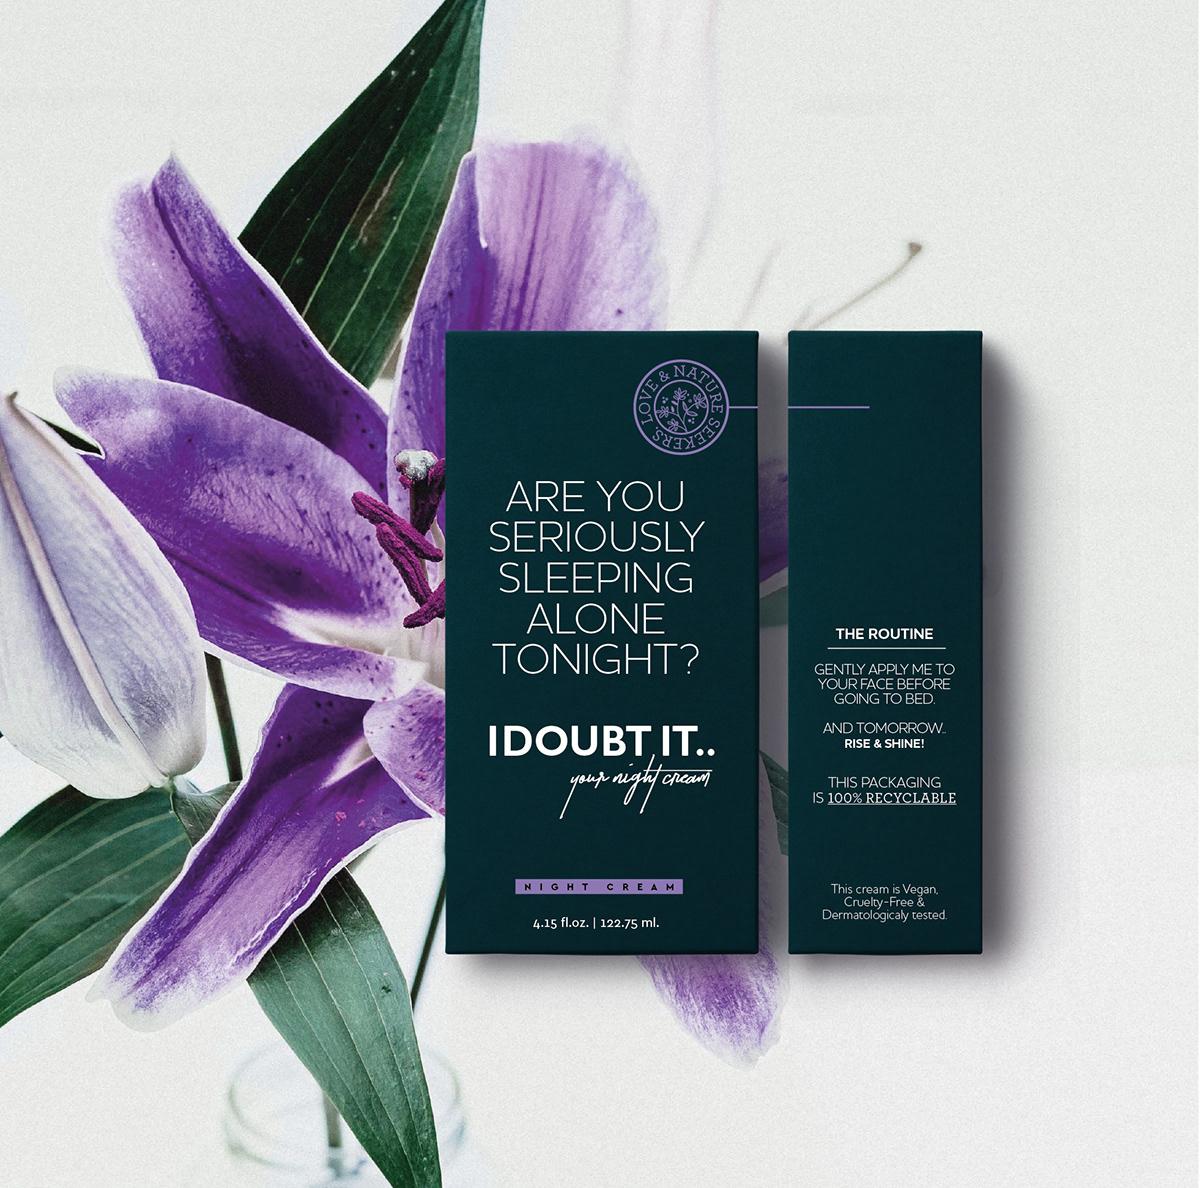 Nature cosmetics creams beauty Packaging natural skin care design ILLUSTRATION  branding  hamburg christina dumont